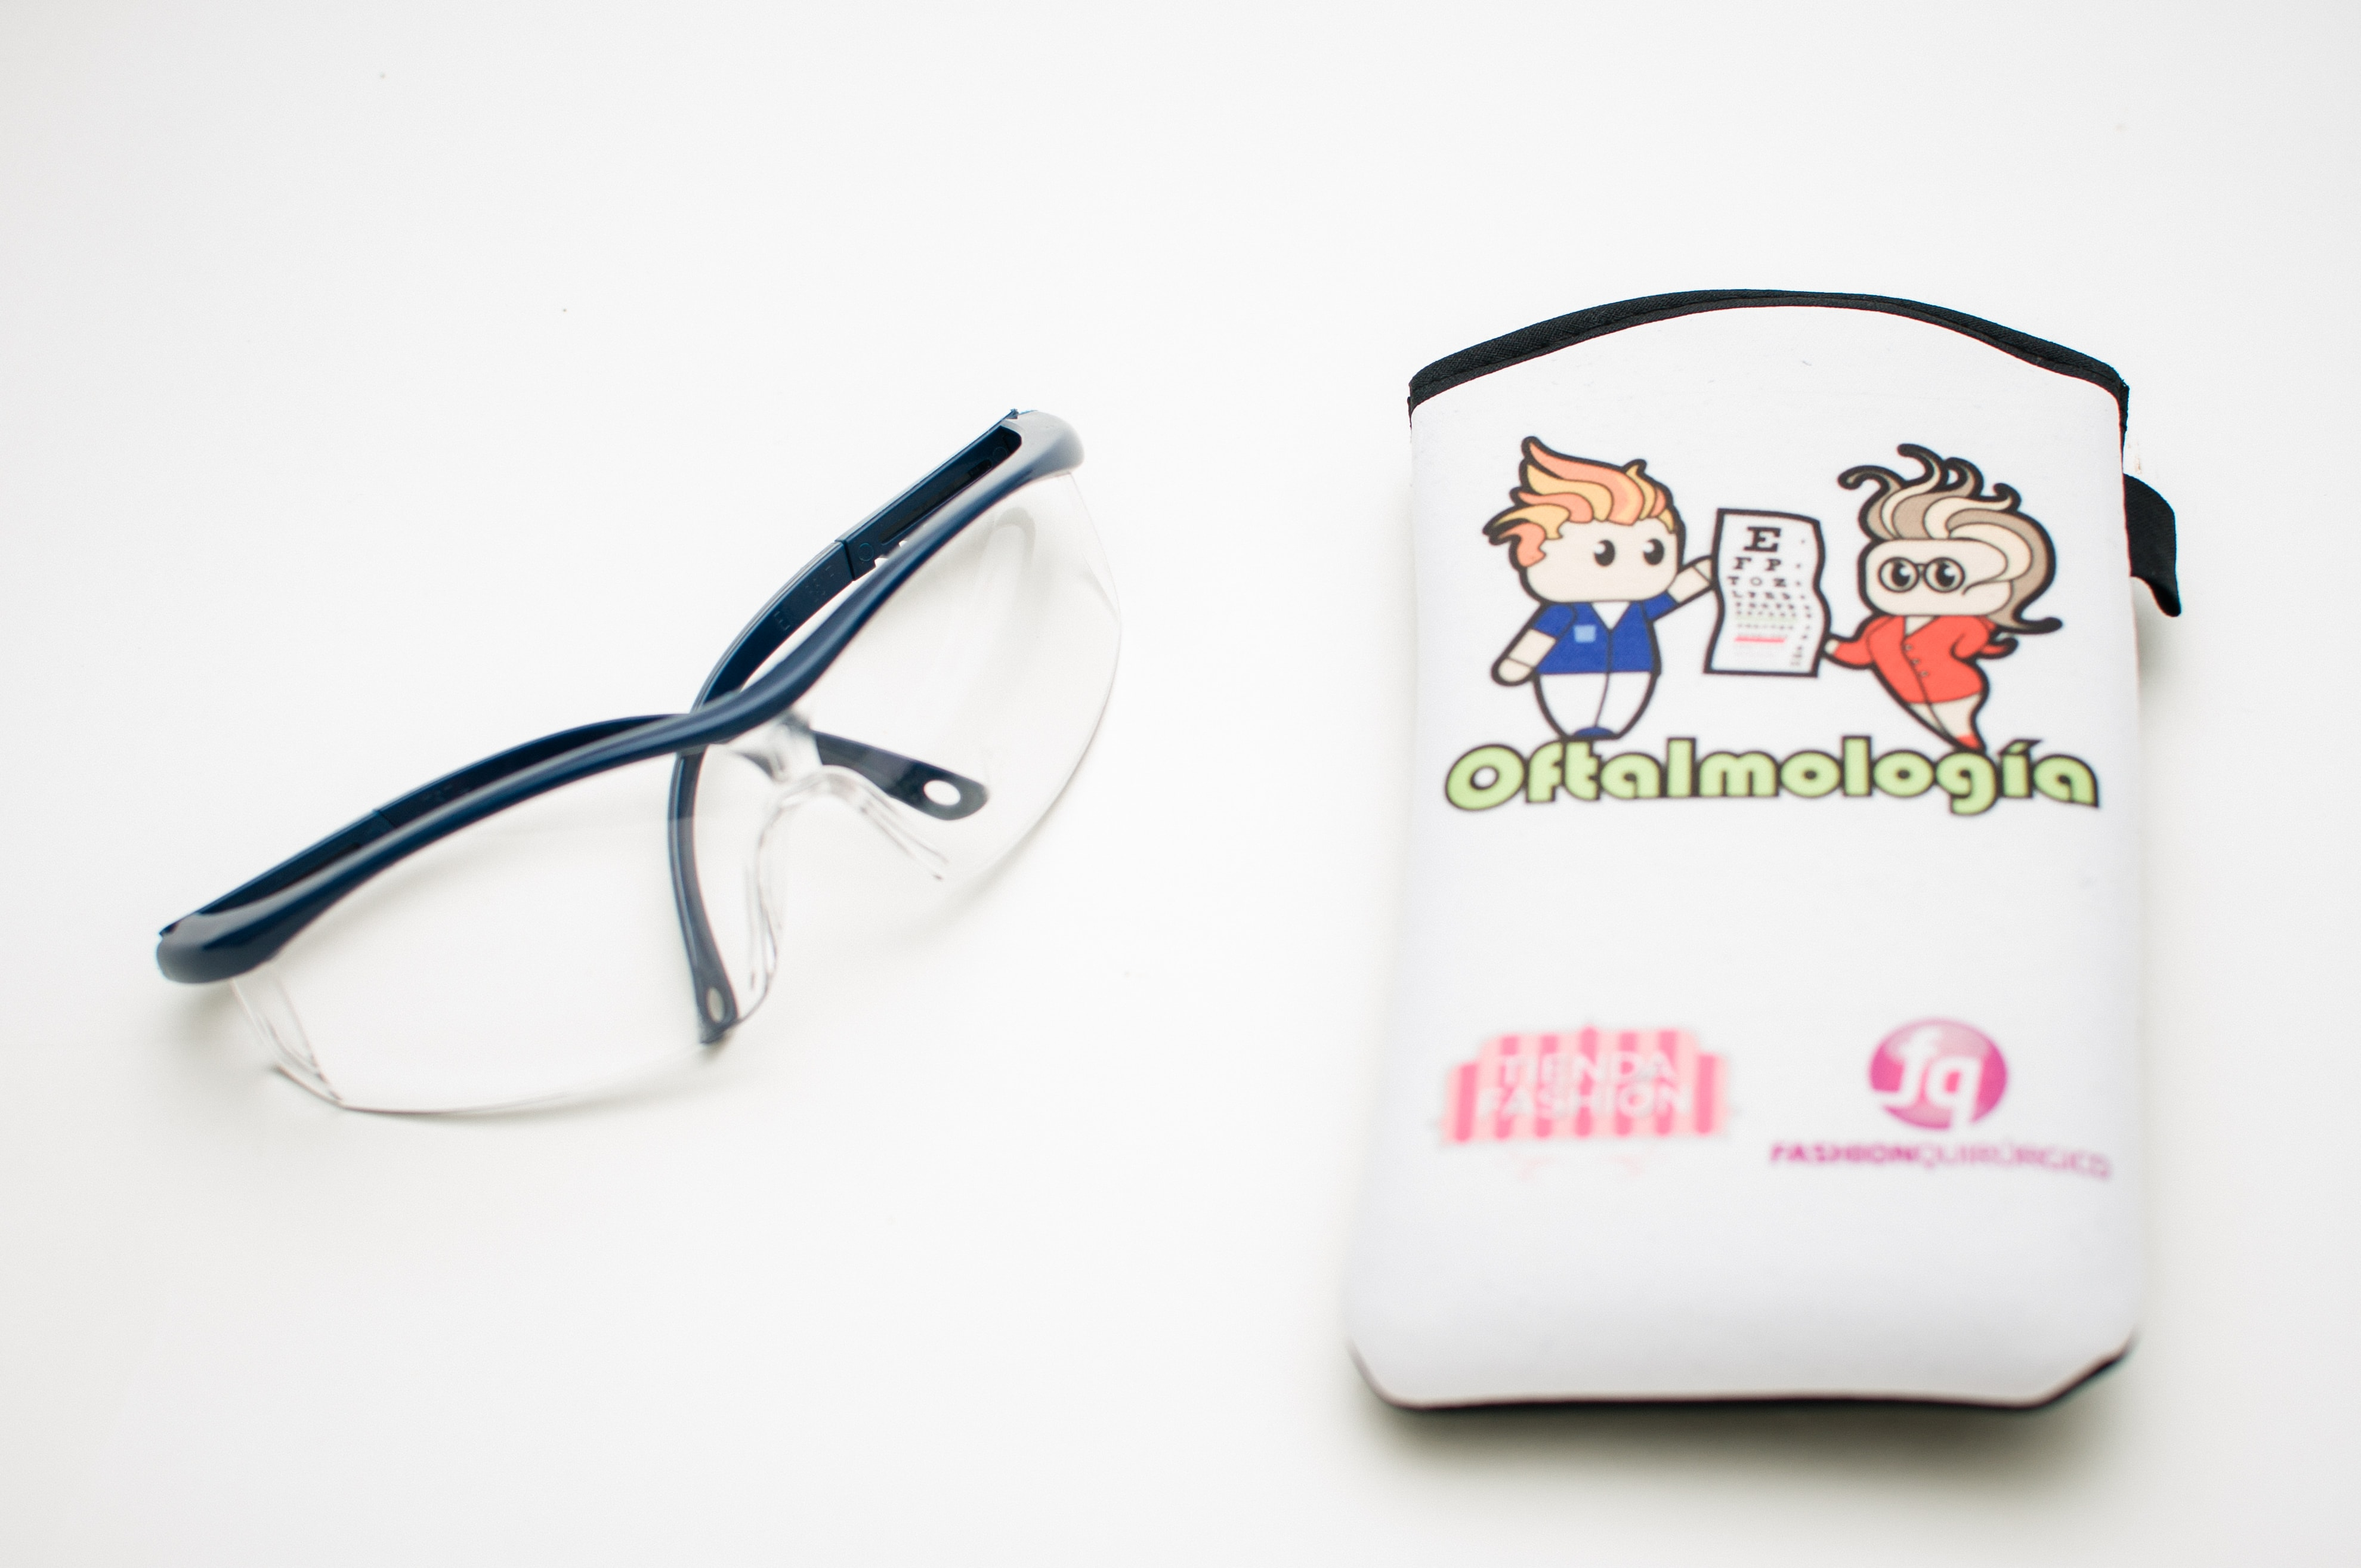 Oftalmologia - Estuche Anteojos de seguridad